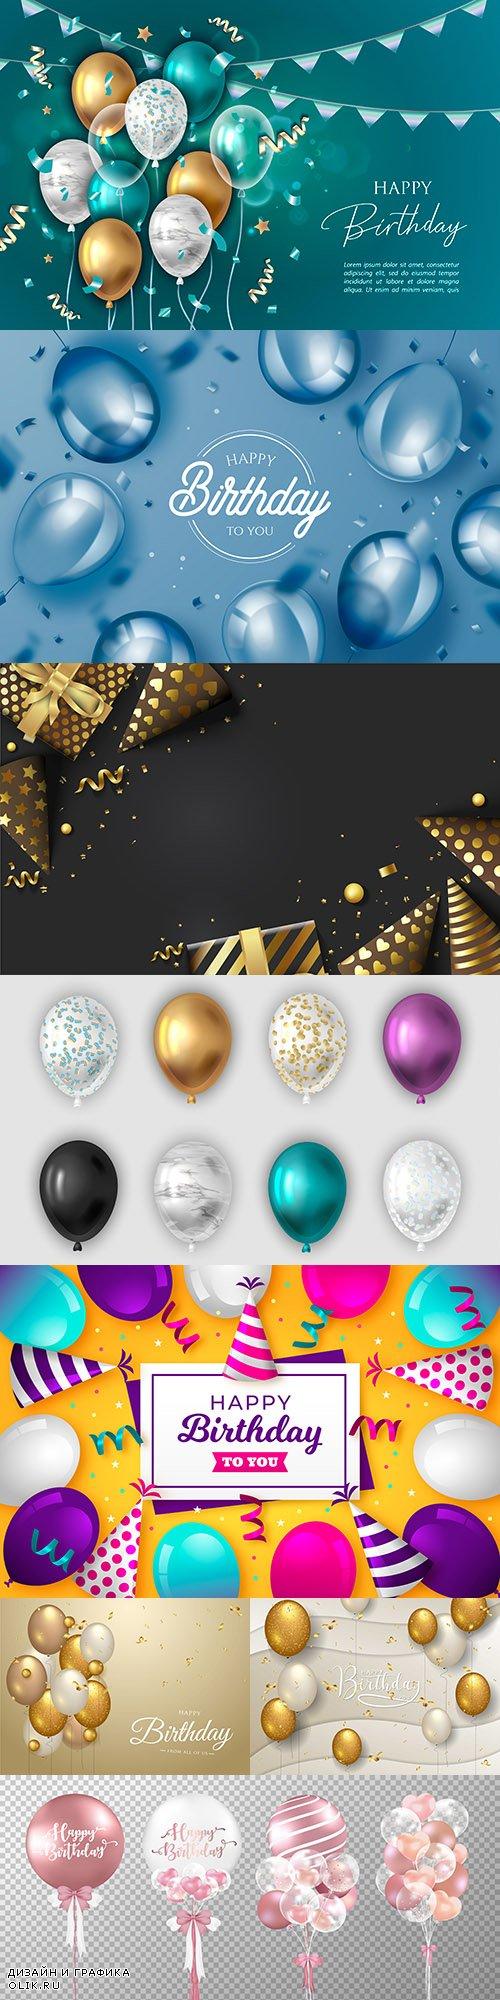 Happy birthday holiday invitation balloons and gifts 22